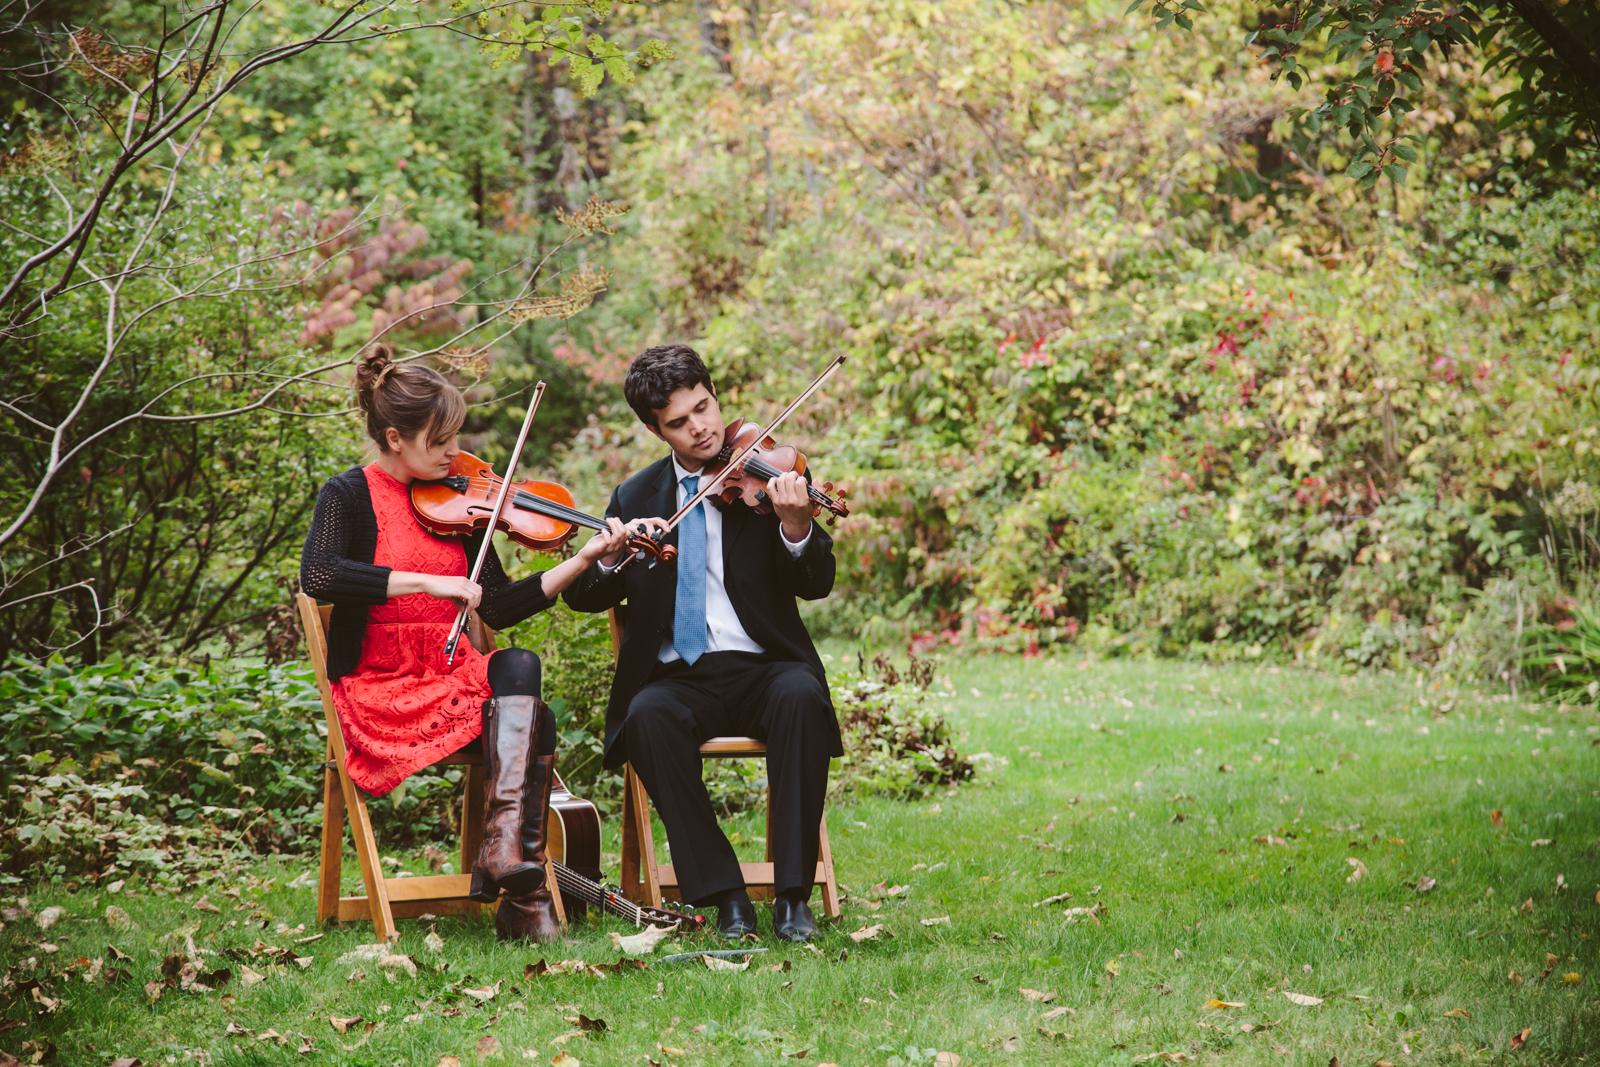 Glimmerstone-Mansion-Vermont-Wedding-Photography-Amanda-Morgan-44.jpg